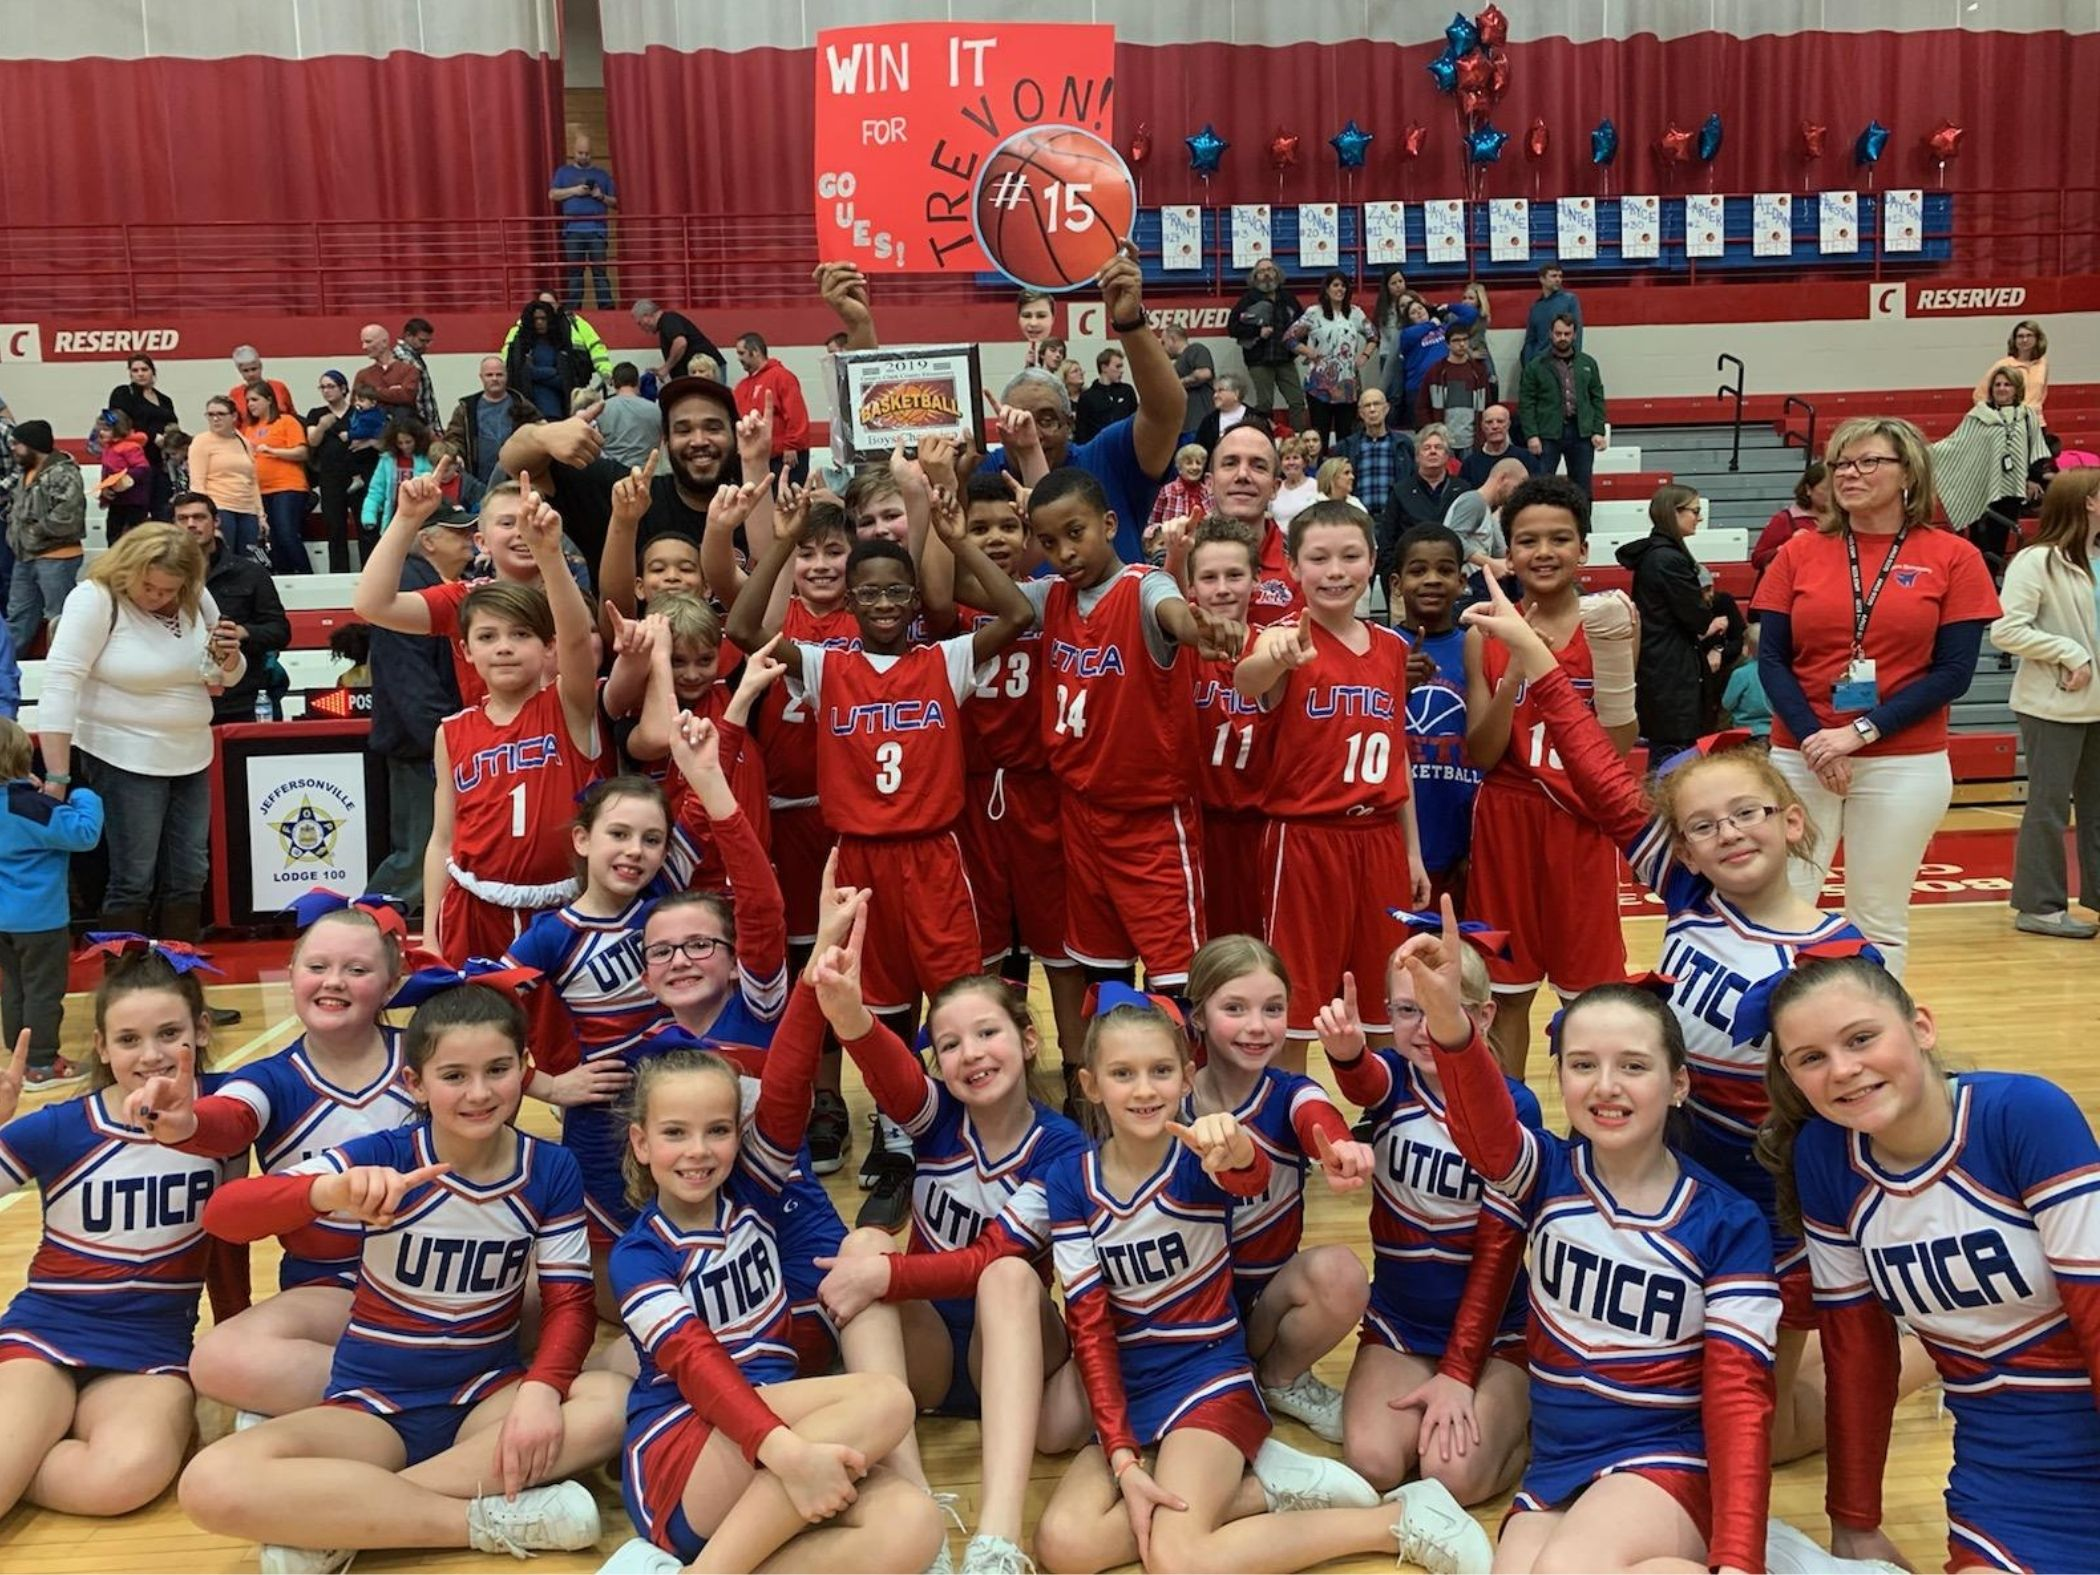 Winning basketball team poses with cheerleaders